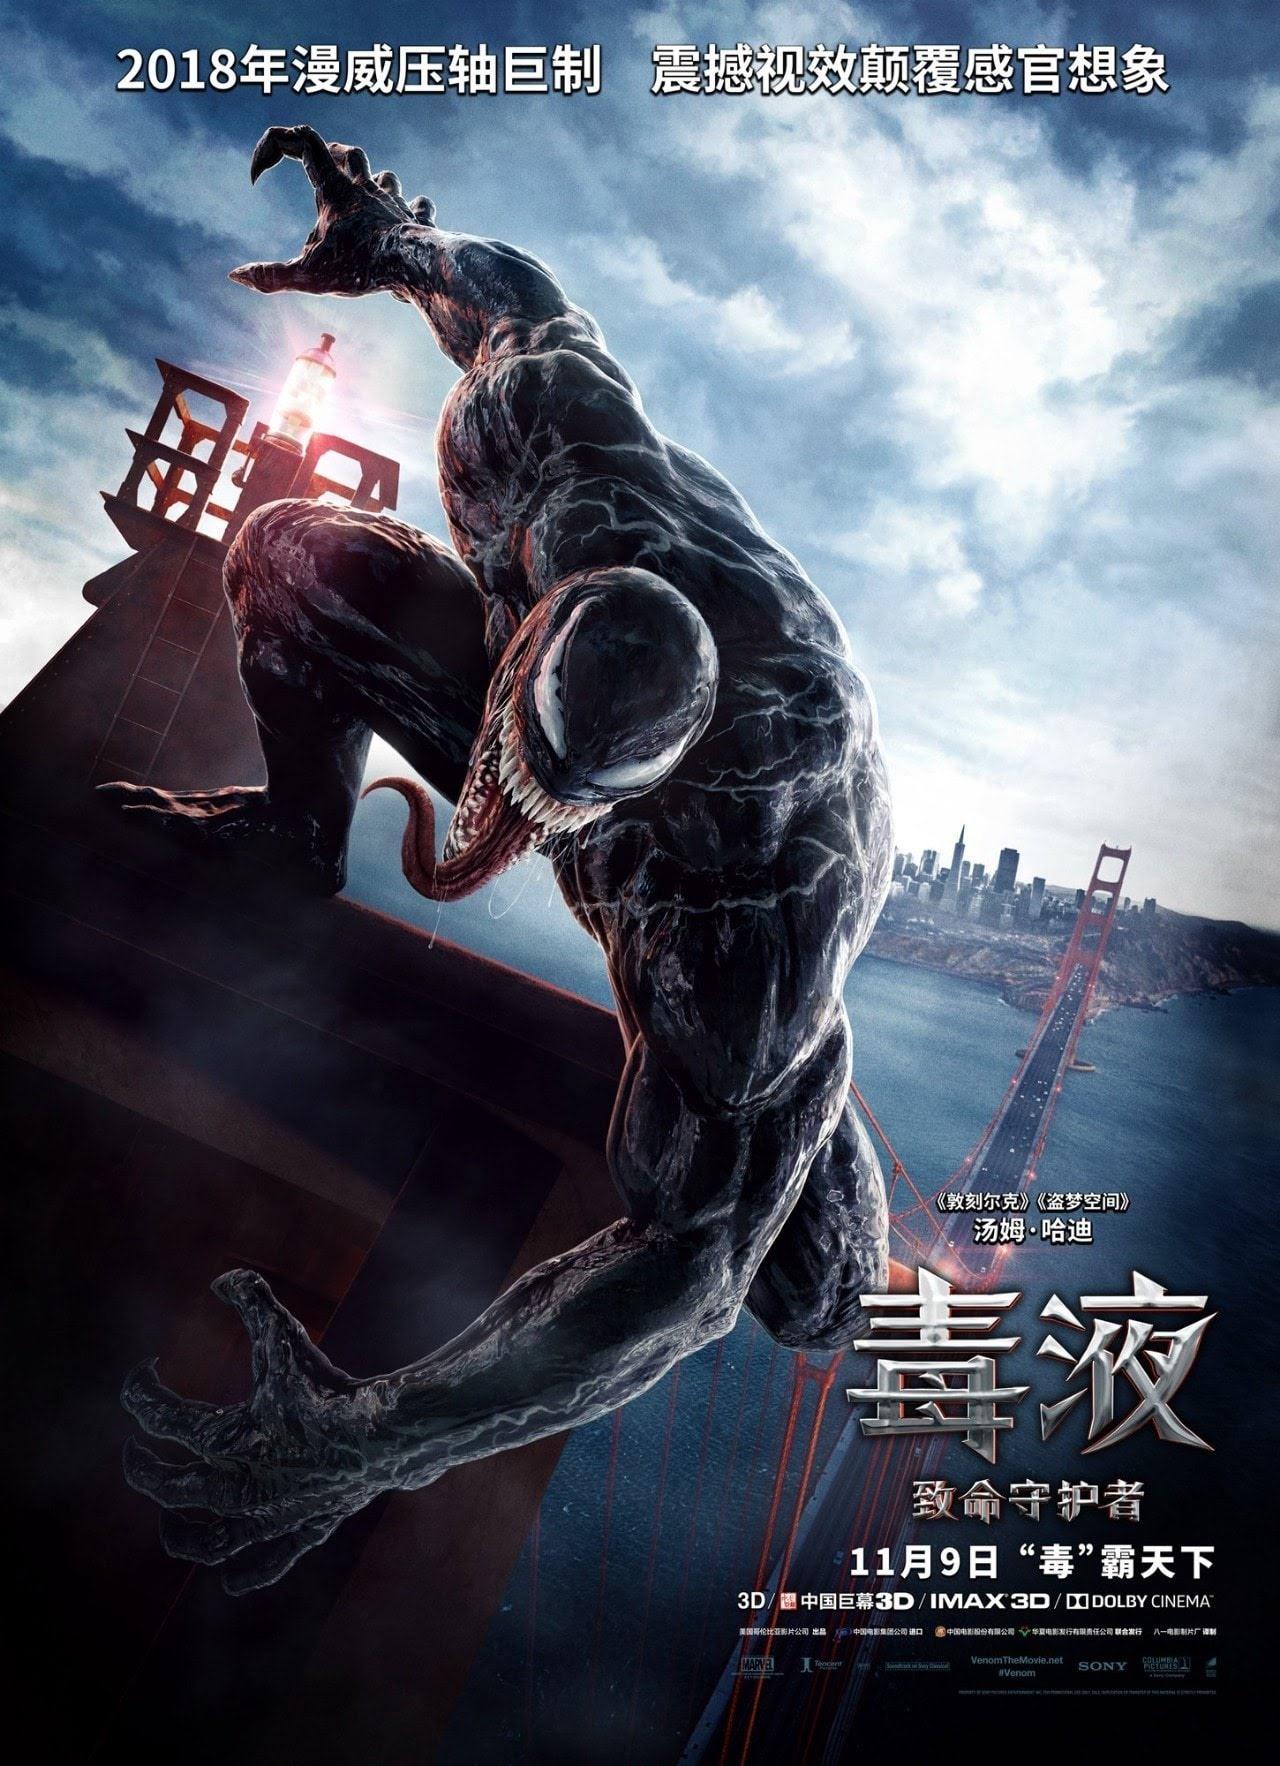 Venom Chinese Poster : トム・ハーディ主演の大ヒット作「ヴェノム」の中華版「毒液」の新しいポスター ! !